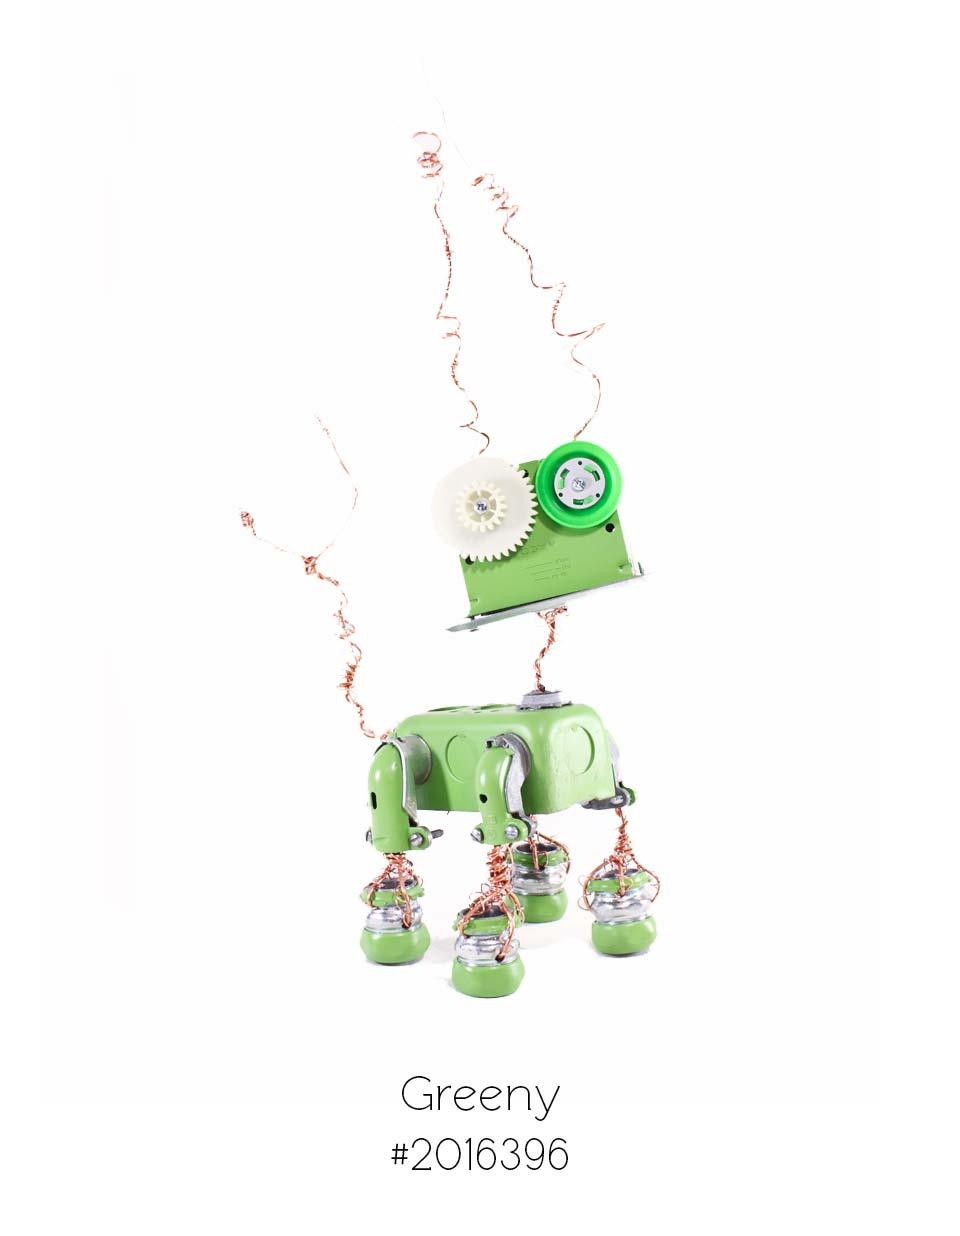 bots-5